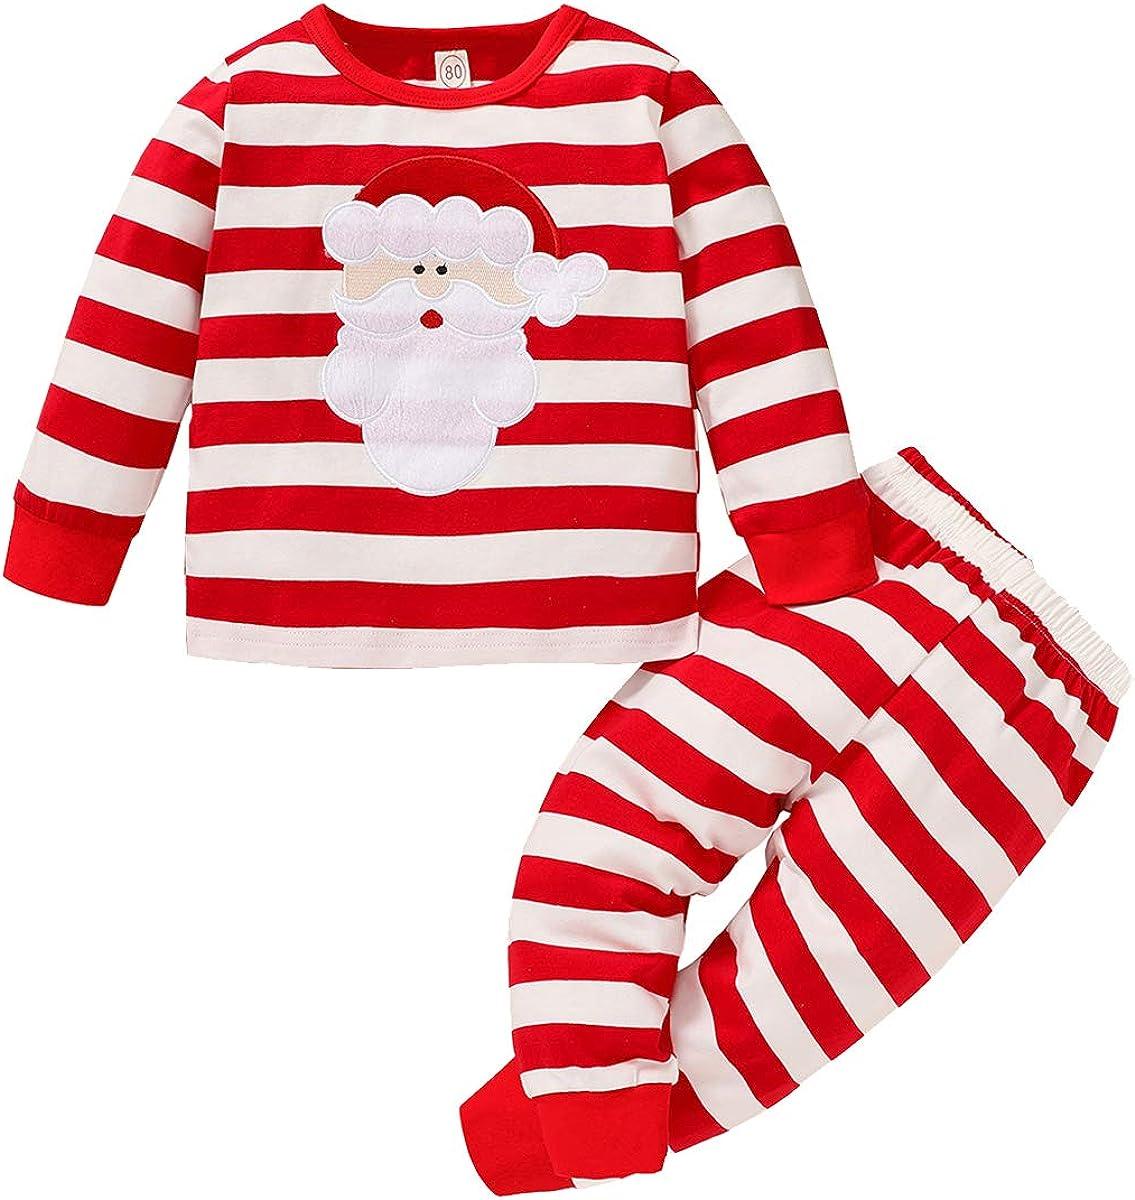 Halloween Kids Toddler Baby Boys Girls Outfit Long Sleeve Mummy Stripes T-Shirt+Pants Fall Pajamas Clothes Set